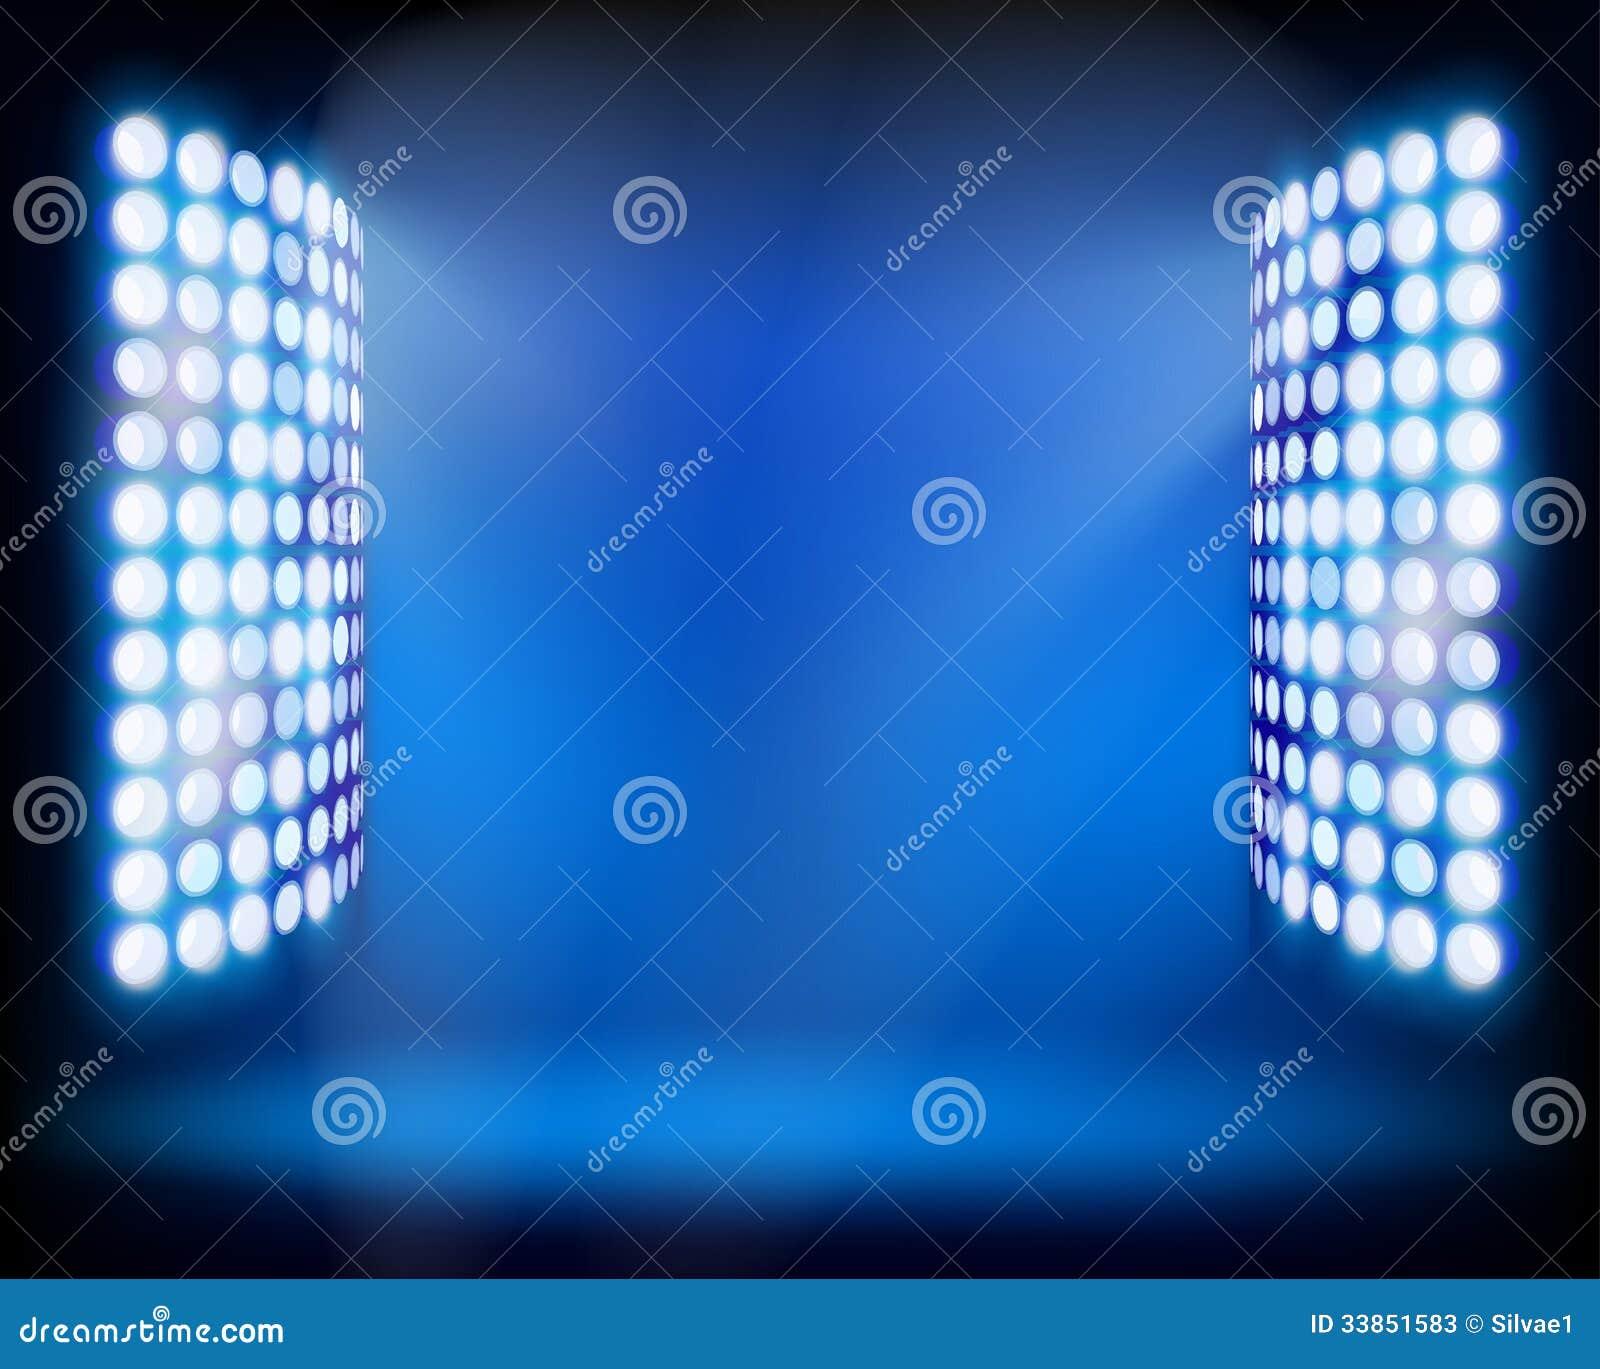 Stadium Lights Svg: The Stadium Light Towers. Vector Illustration. Stock